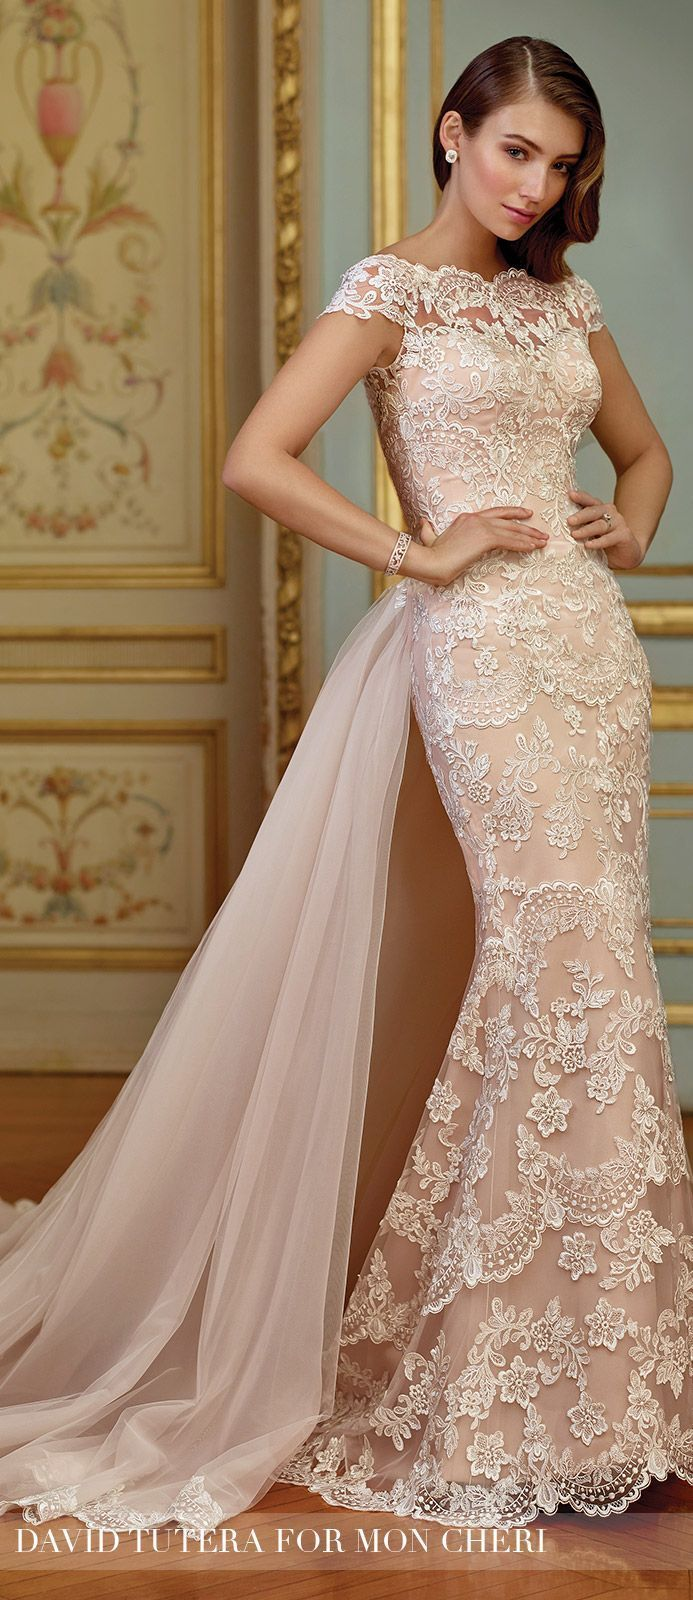 Nice dresses for wedding  Nice Wedding Dresses Wedding dresses  Check more at